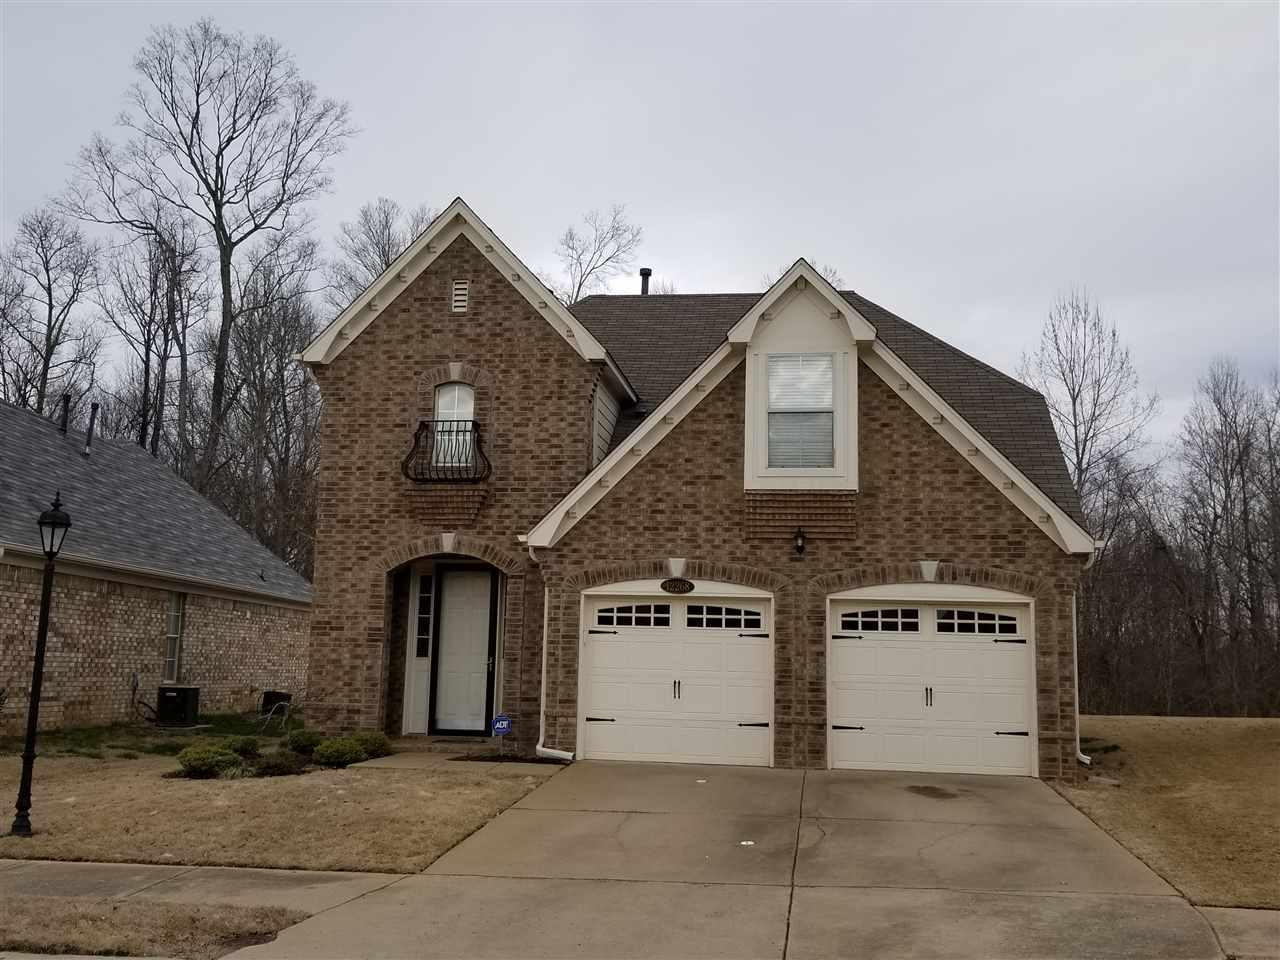 12268 Longleaf Oak, Arlington, TN 38002